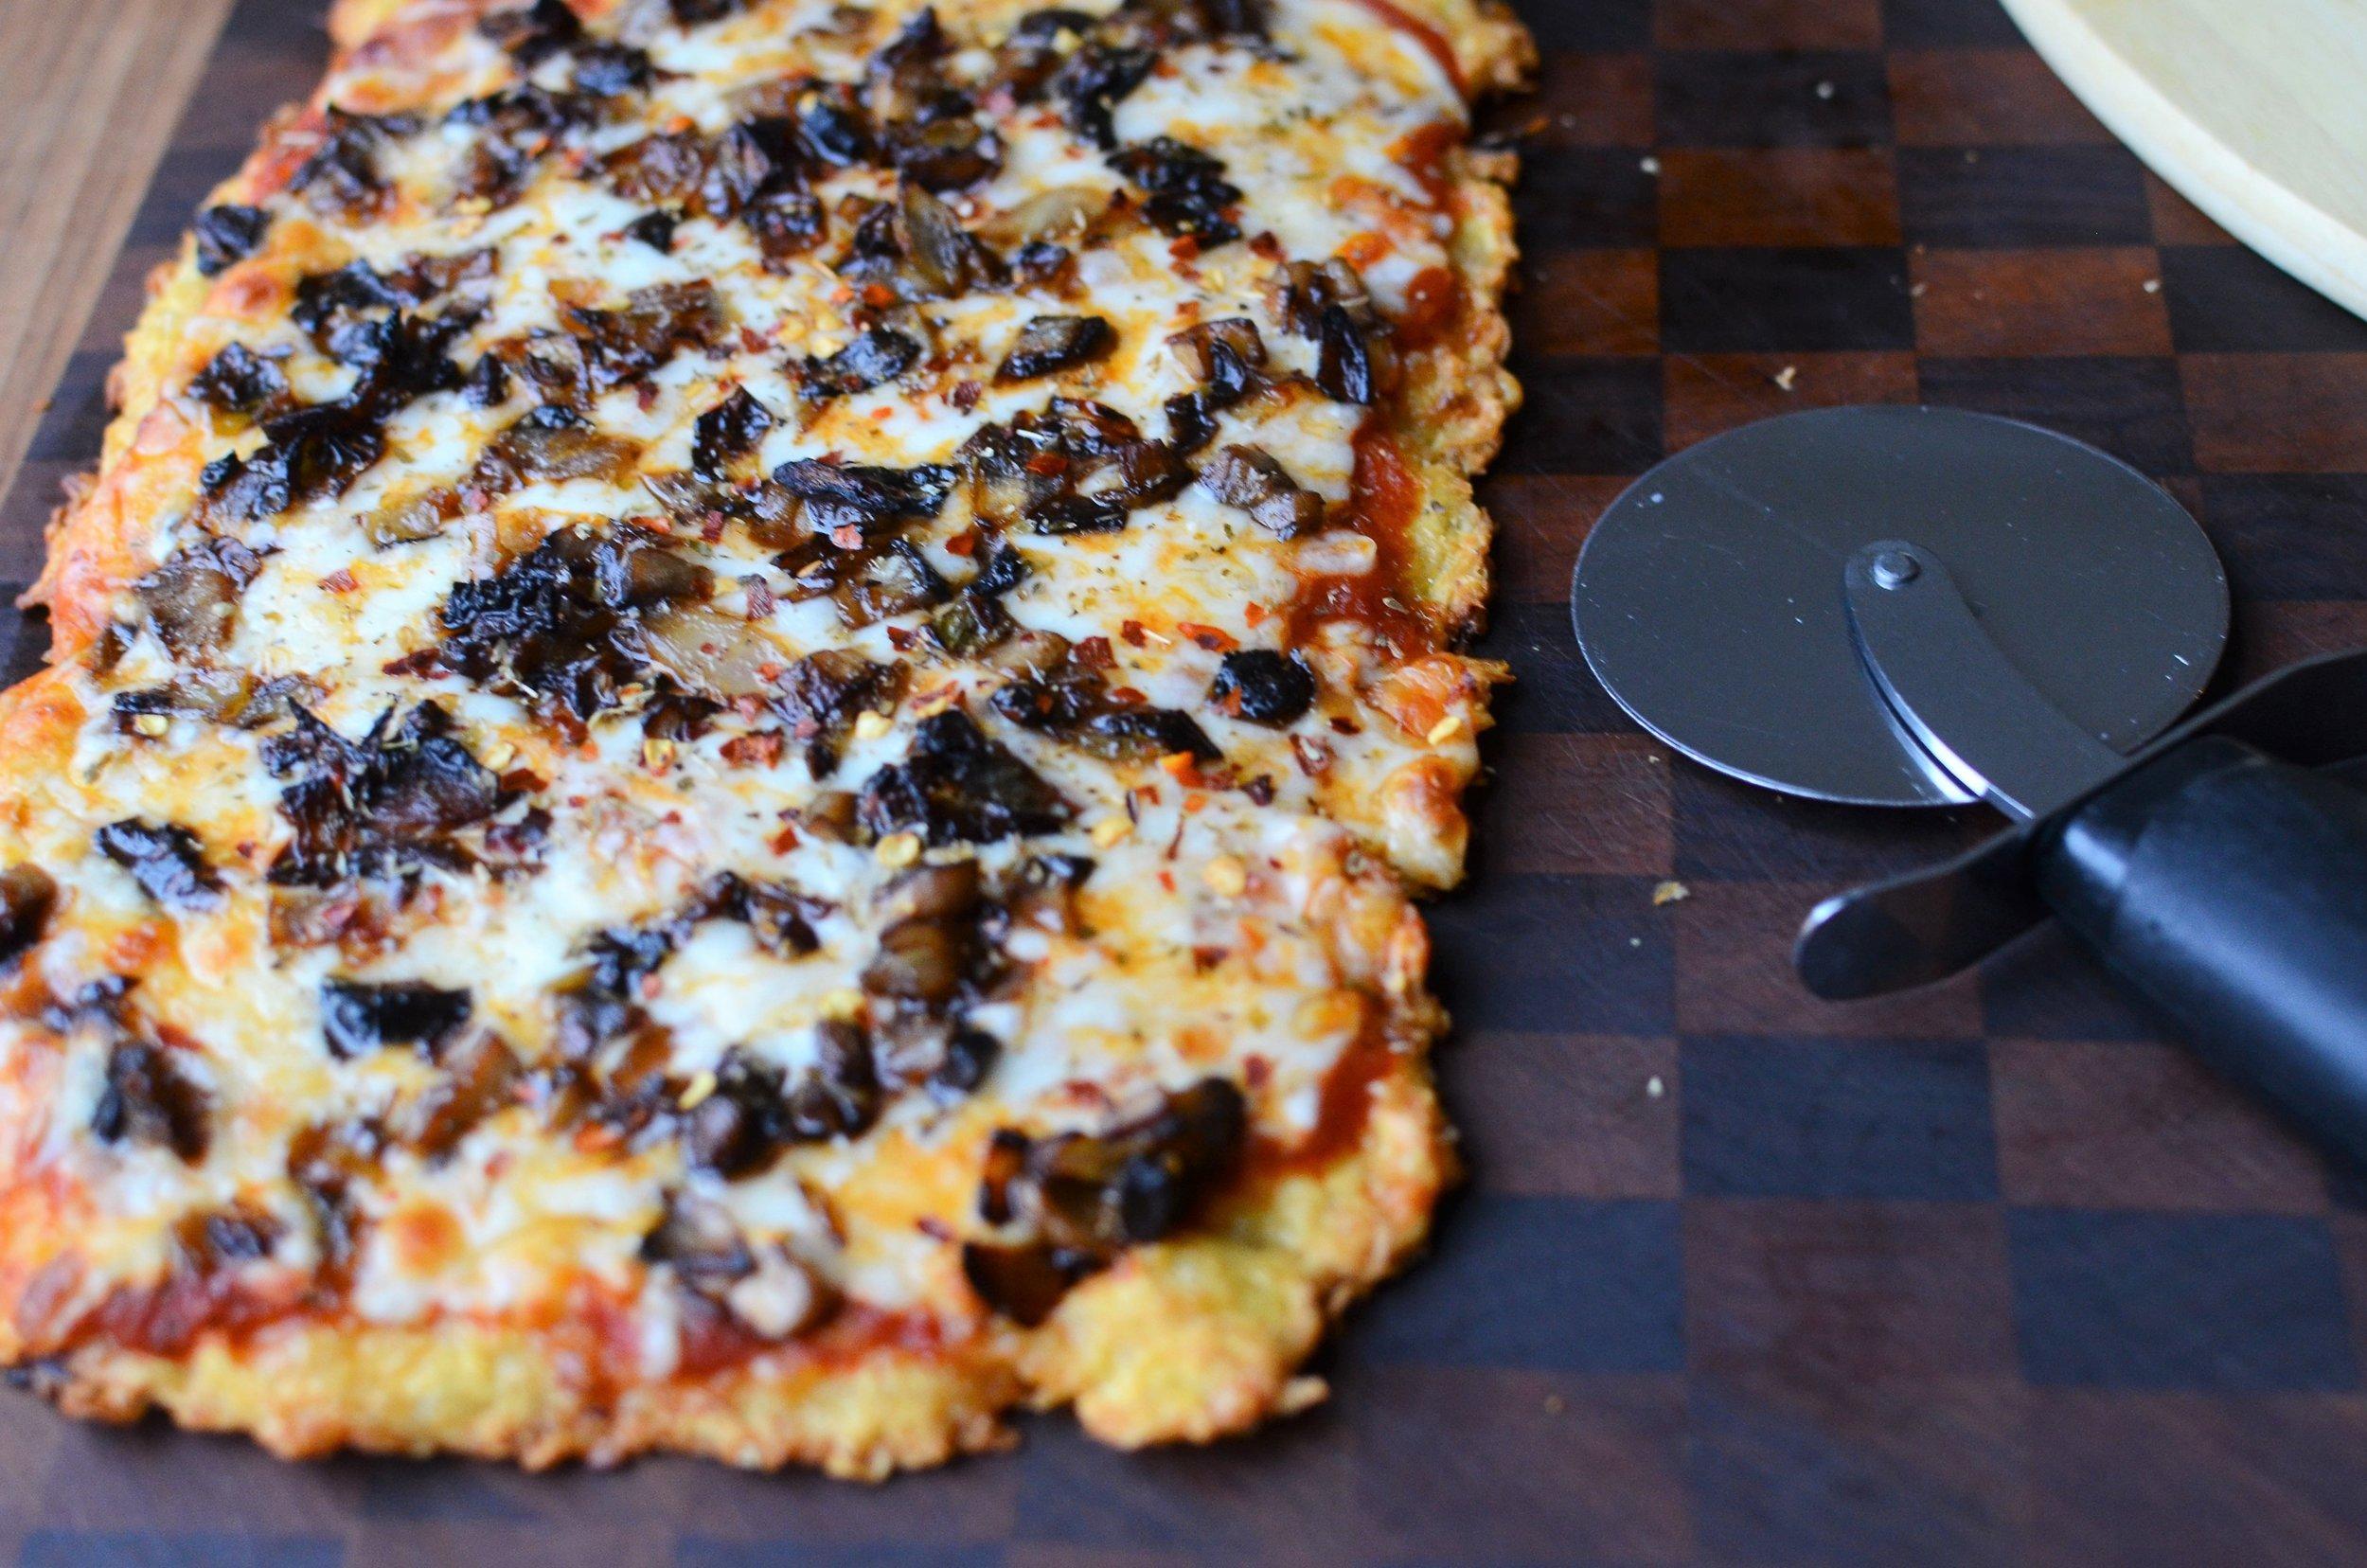 No-Carb, No Cauliflower, High Protein, Gluten-Free, Keto-Friendly Pizza Crust